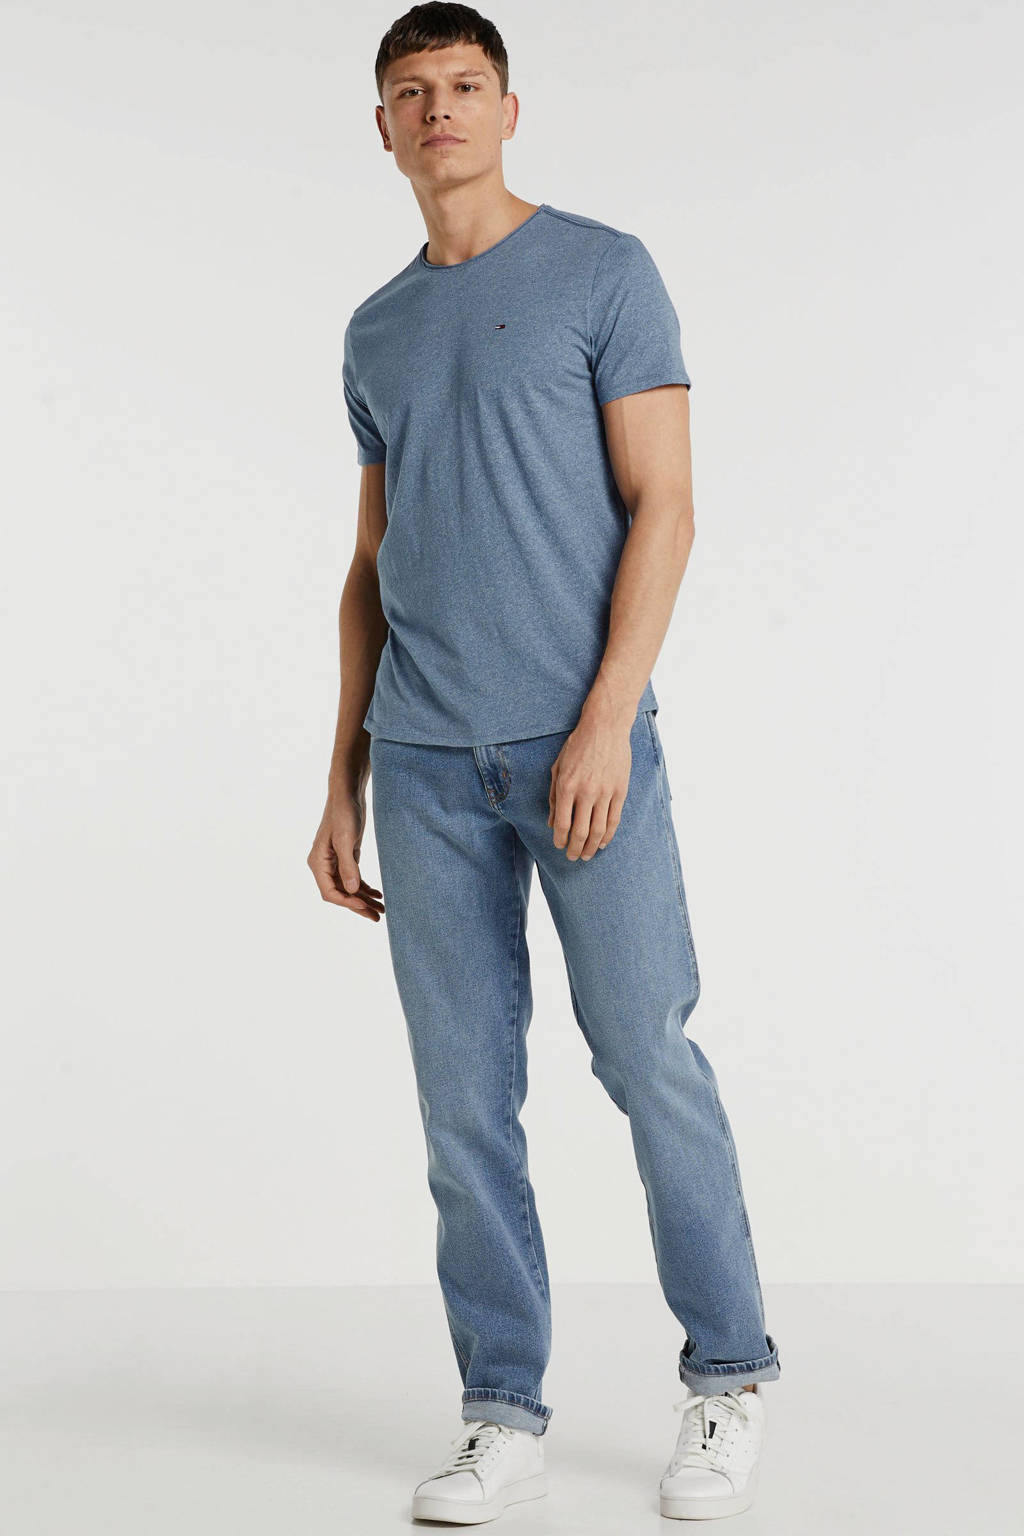 Tommy Jeans T-shirt met logo blauw, Blauw